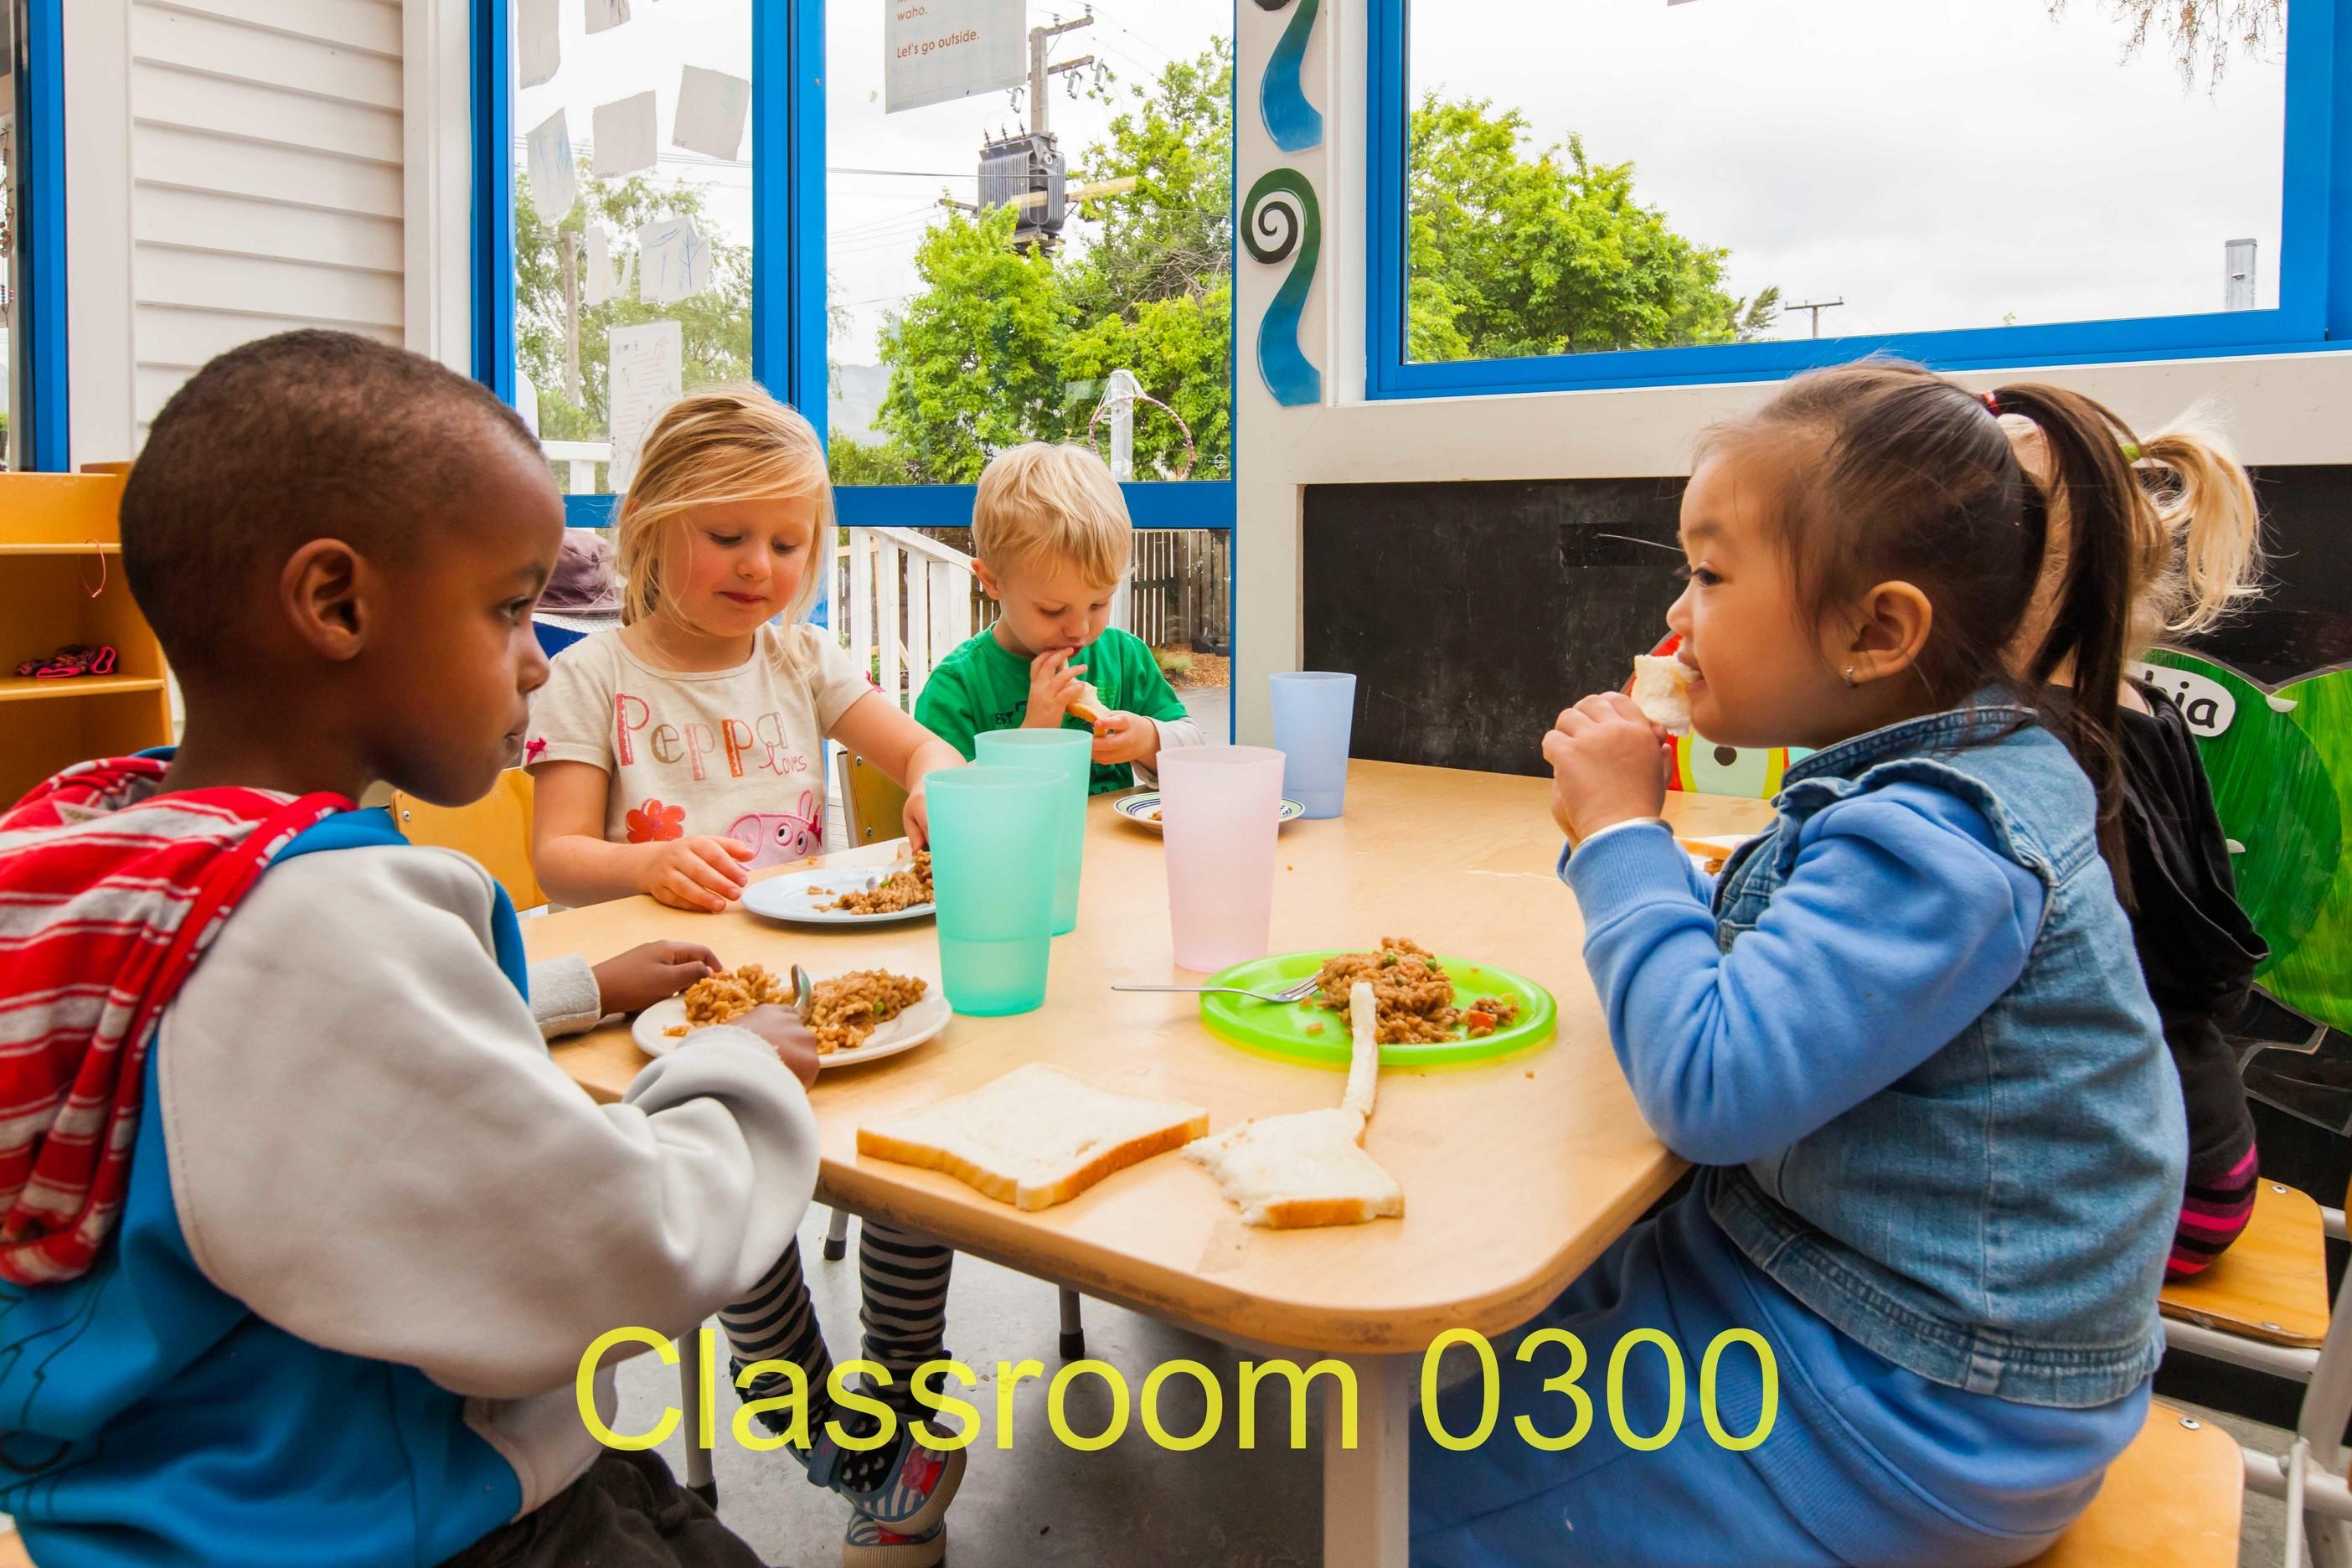 Classroom 0300